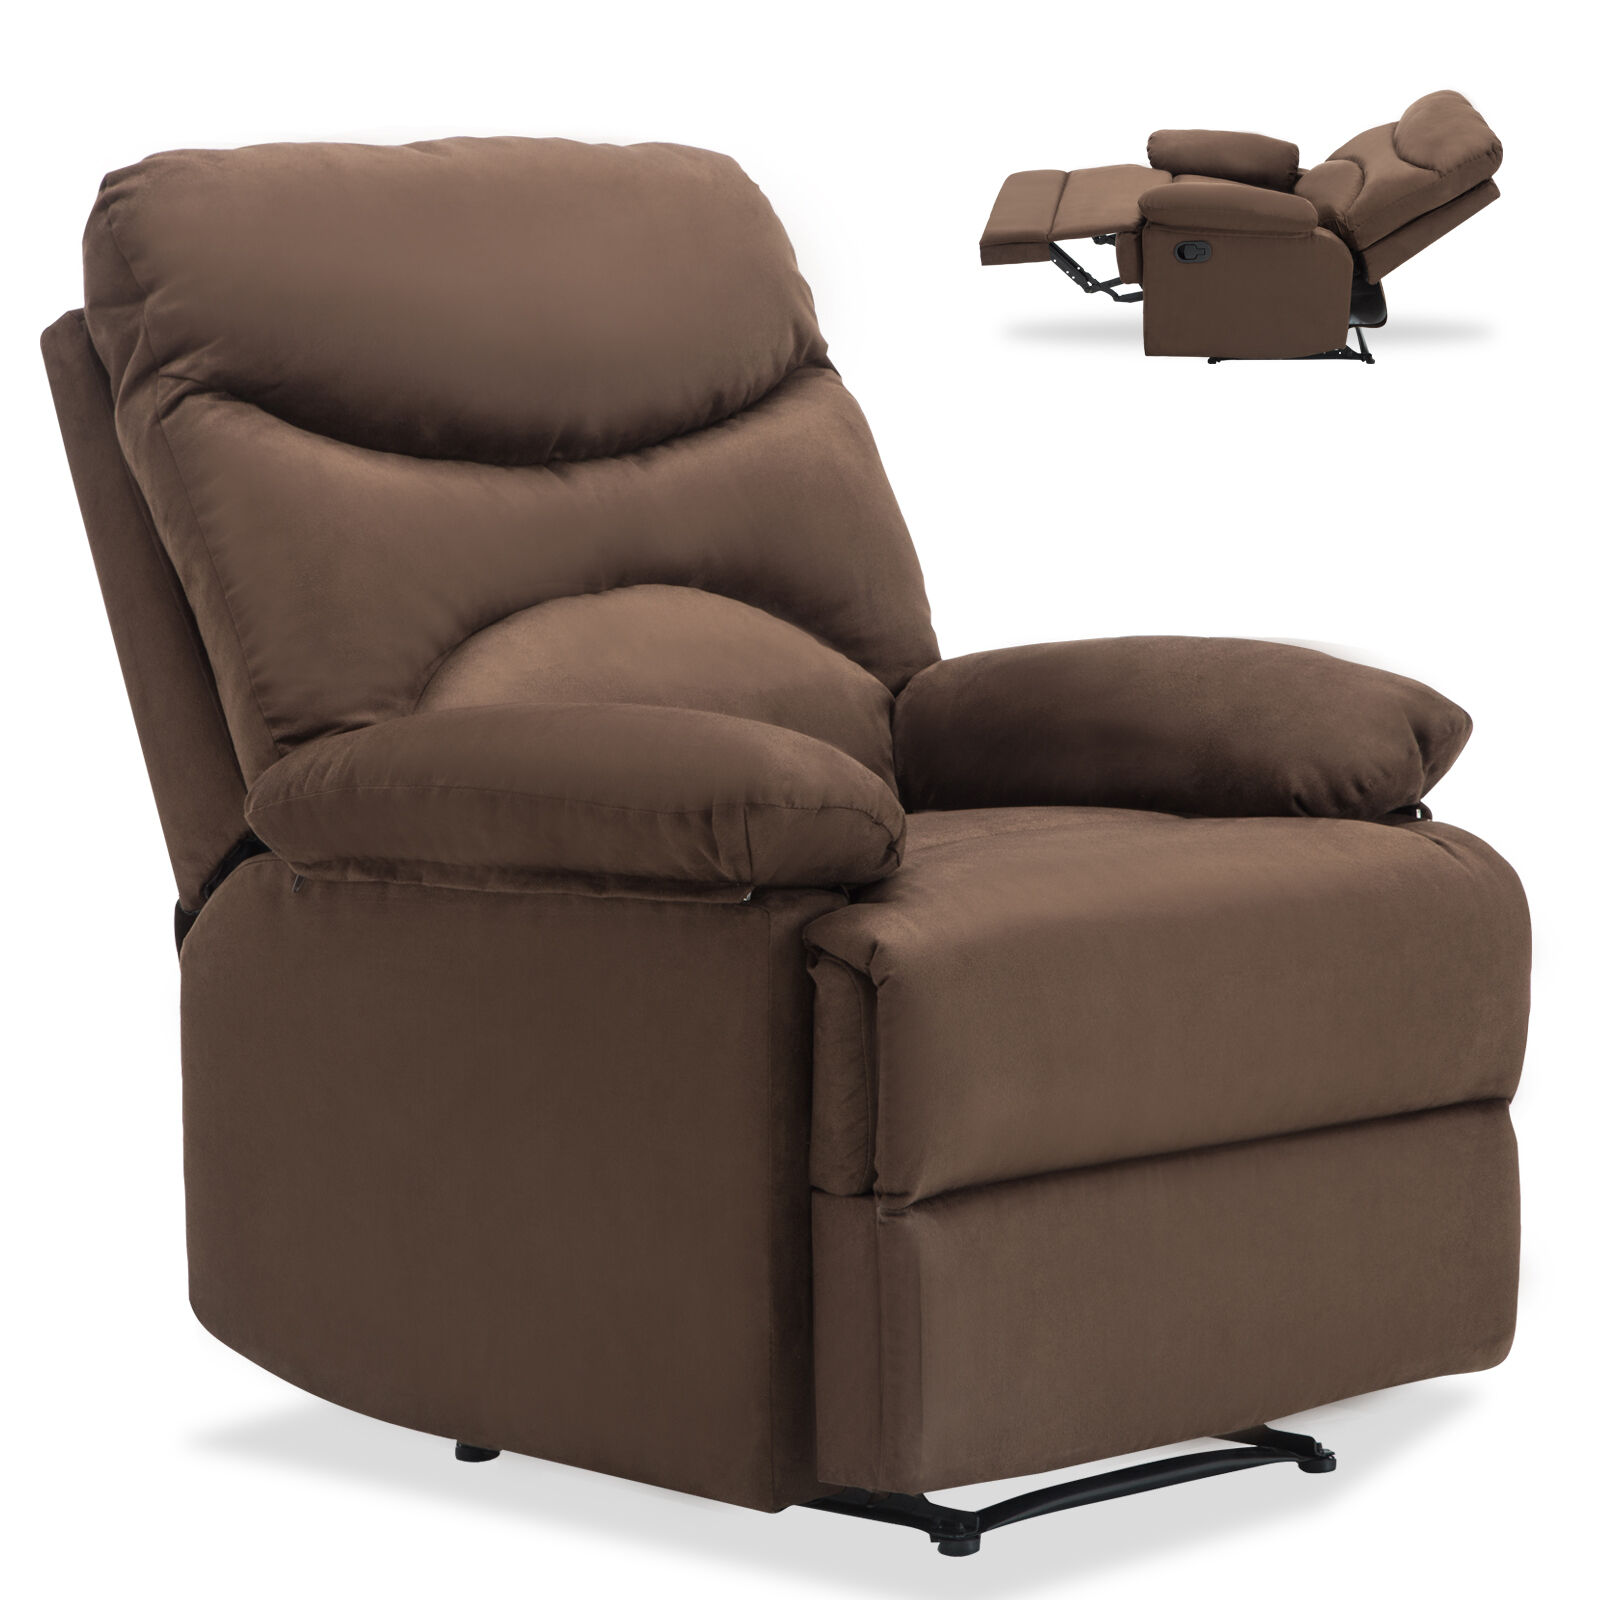 Merveilleux Microfiber Massage Recliner Sofa Chair Ergonomic Lounge Swivel Heated  W/Control